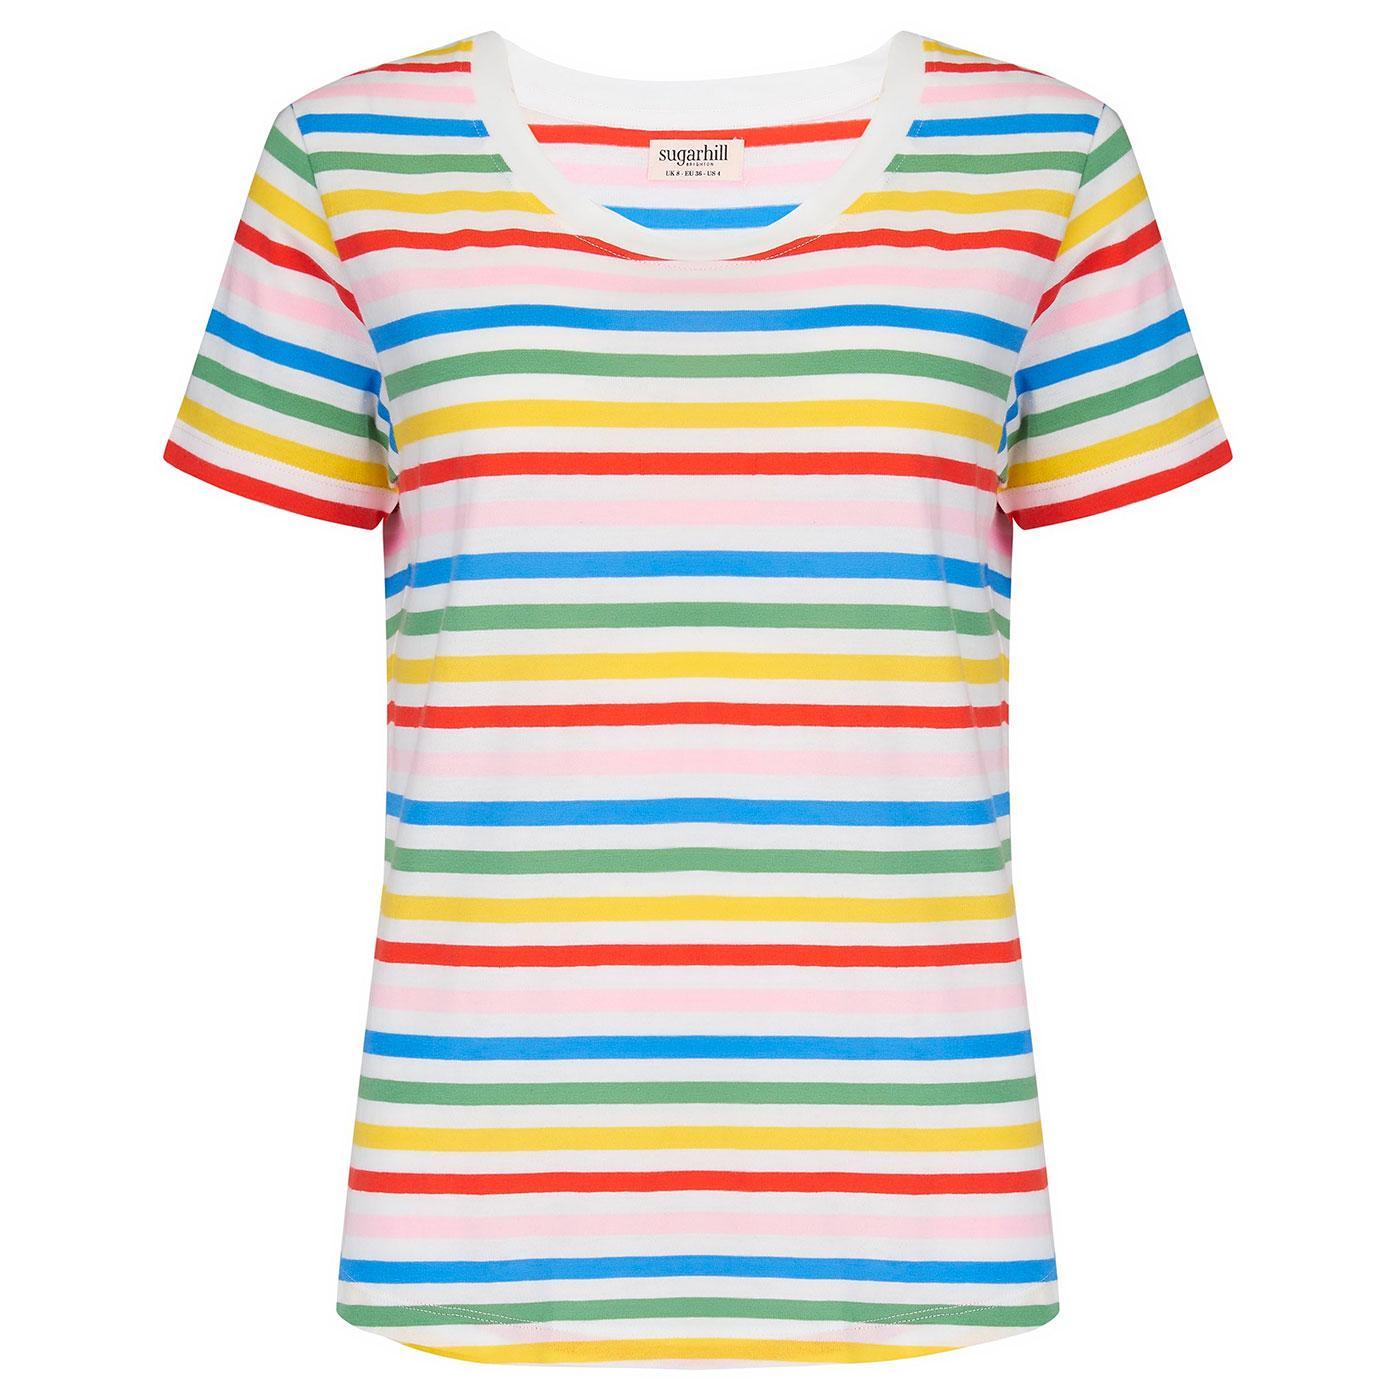 Sylvie SUGARHILL Retro 70s Rainbow Stripe T-Shirt